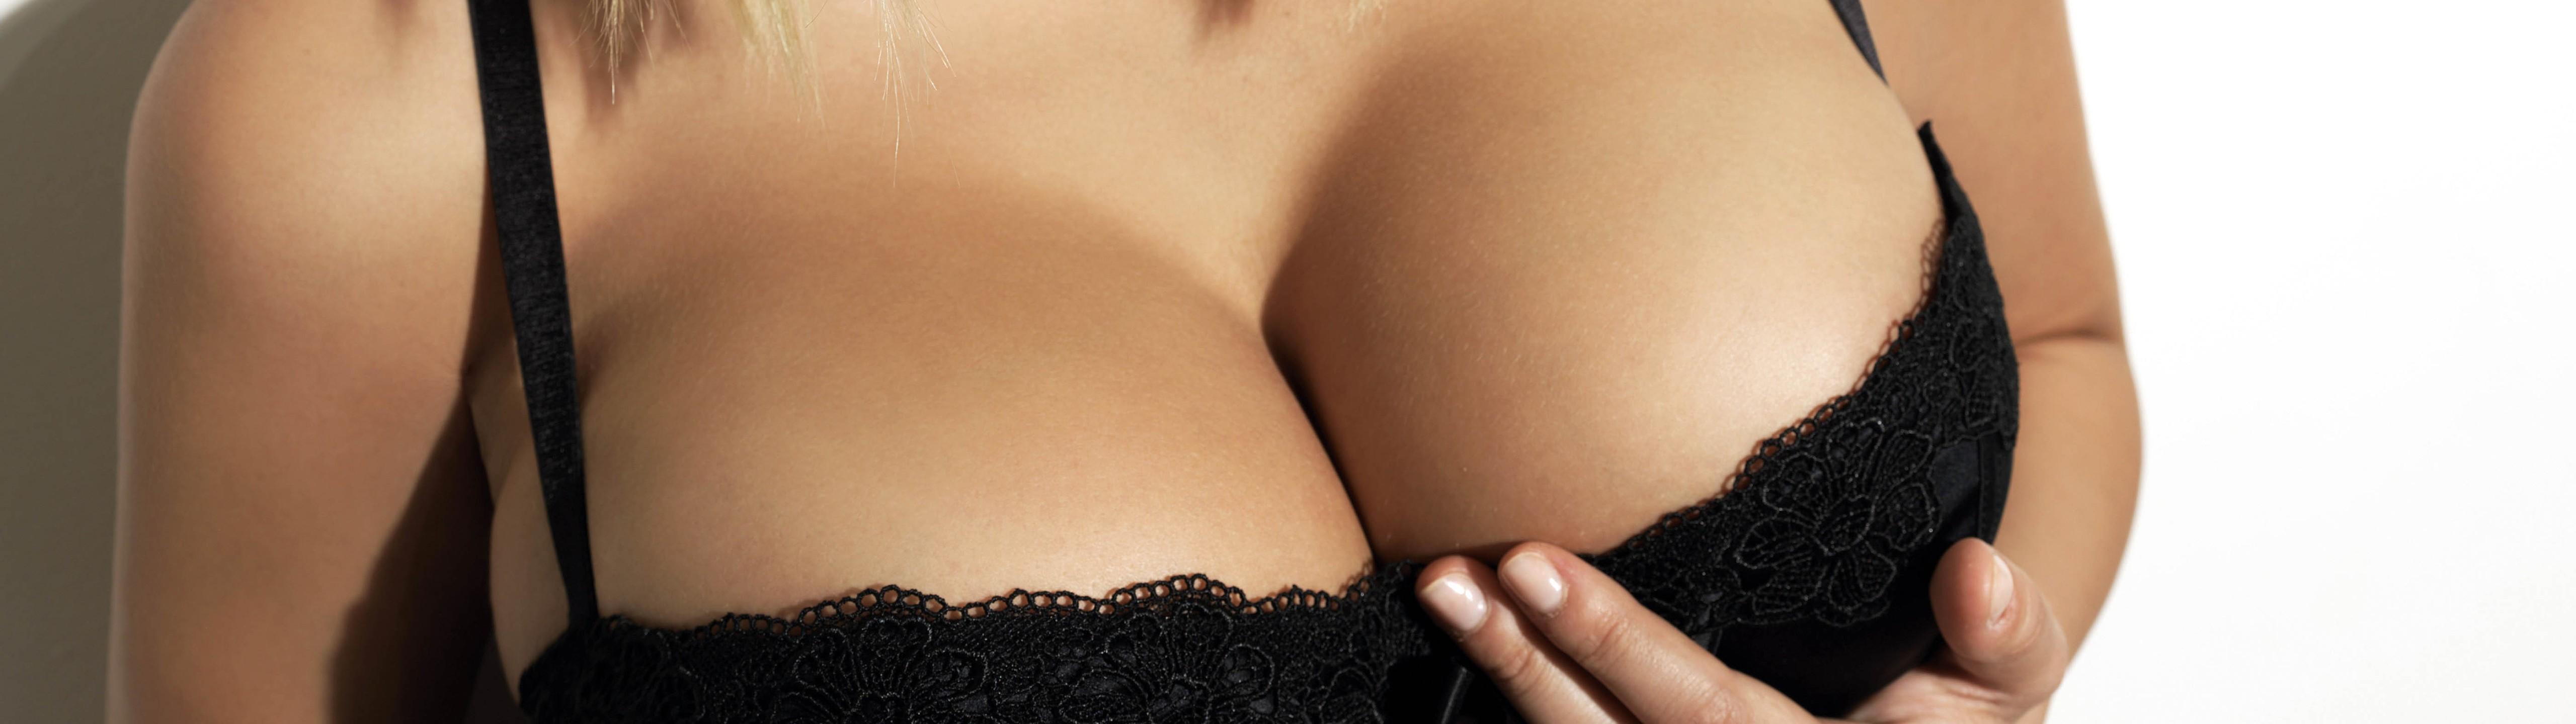 Фото голая сперма на грудях крупным планом порно